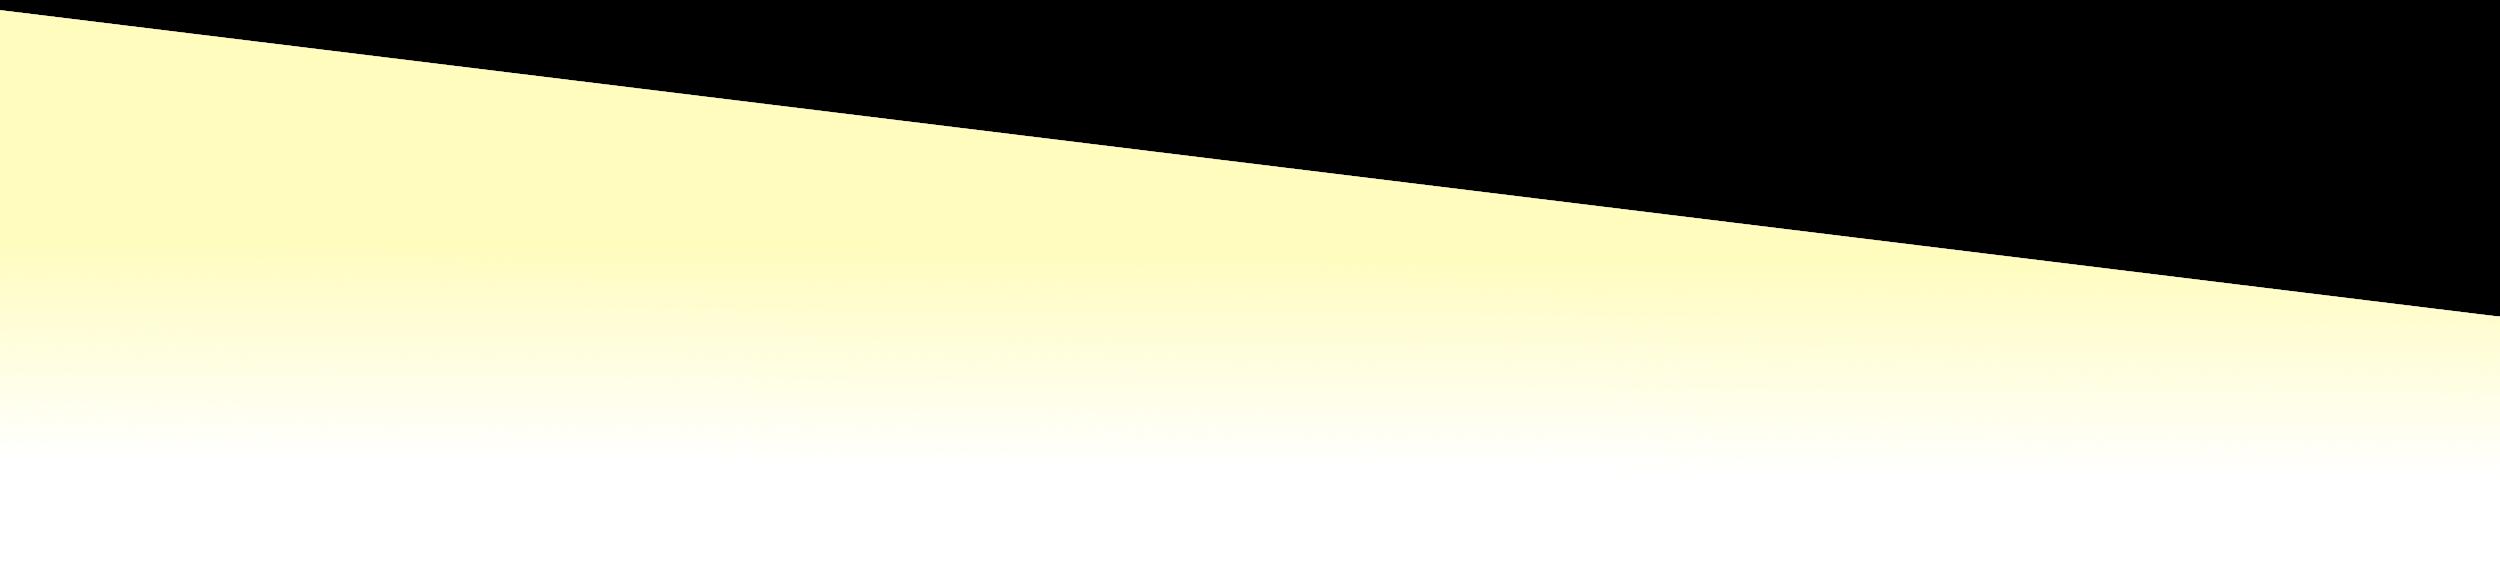 Übergang-1